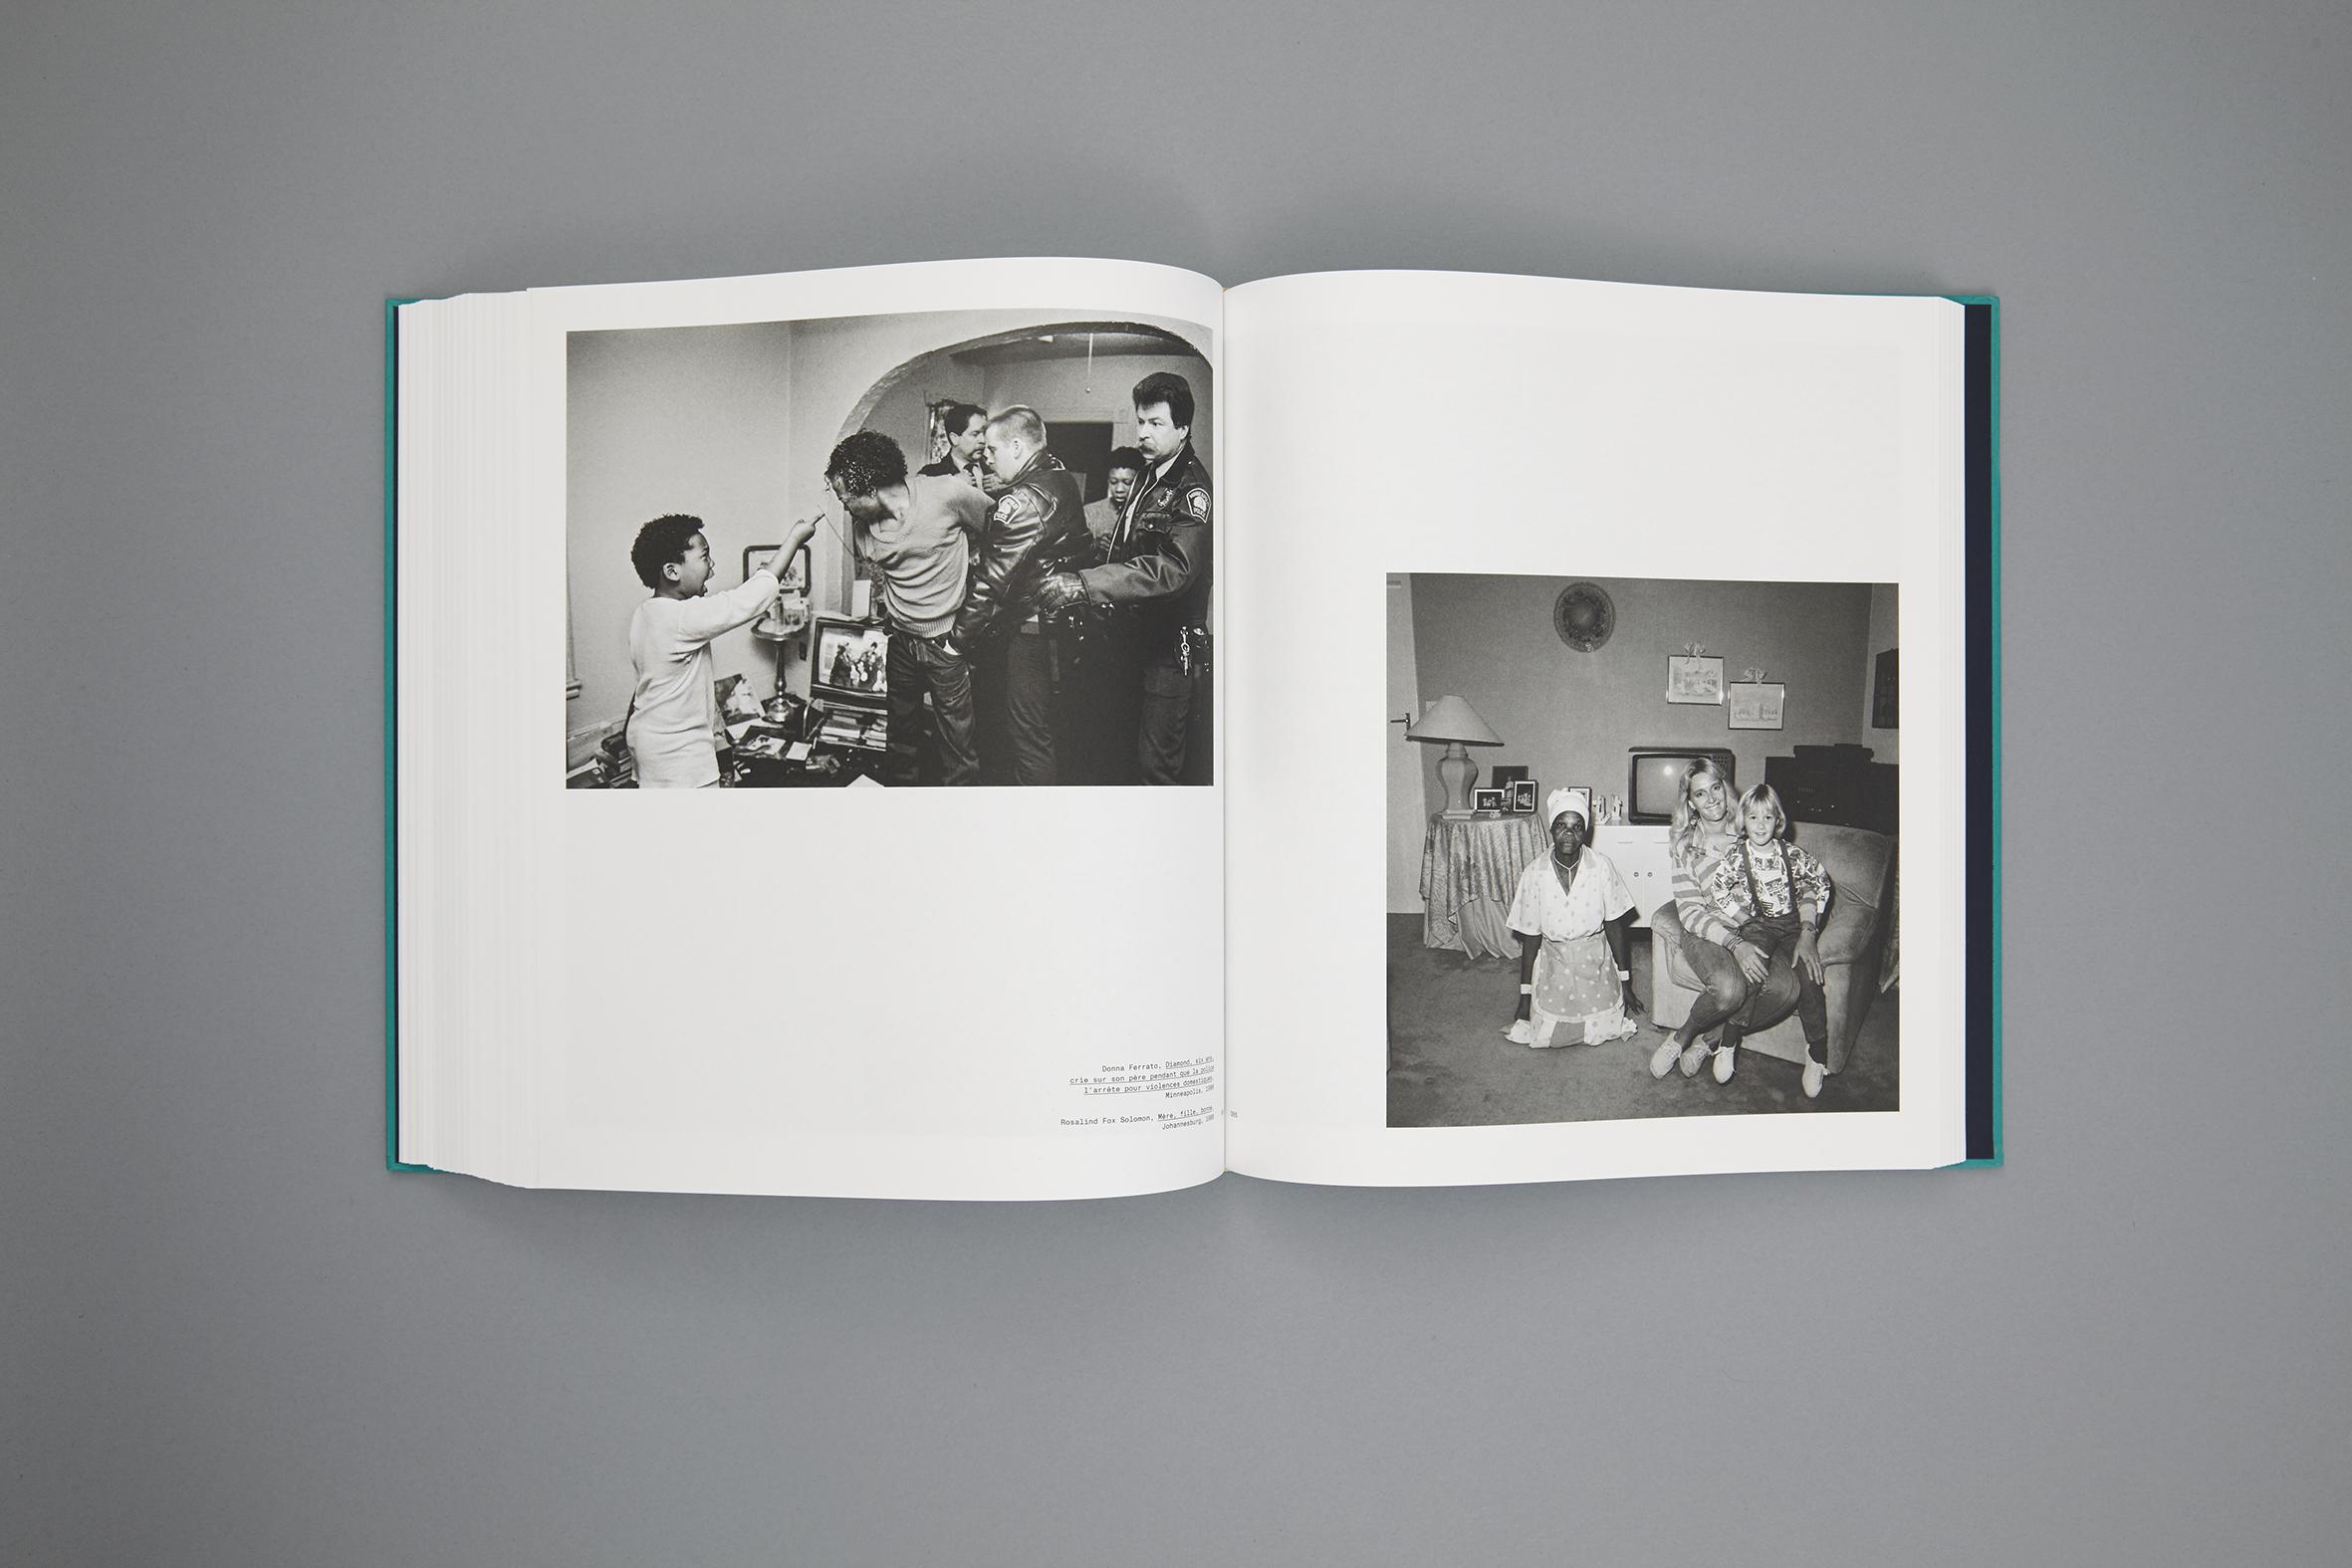 lebart-robert-dahan-histoire-mondiale-femmes-photographes-delpire-co-6